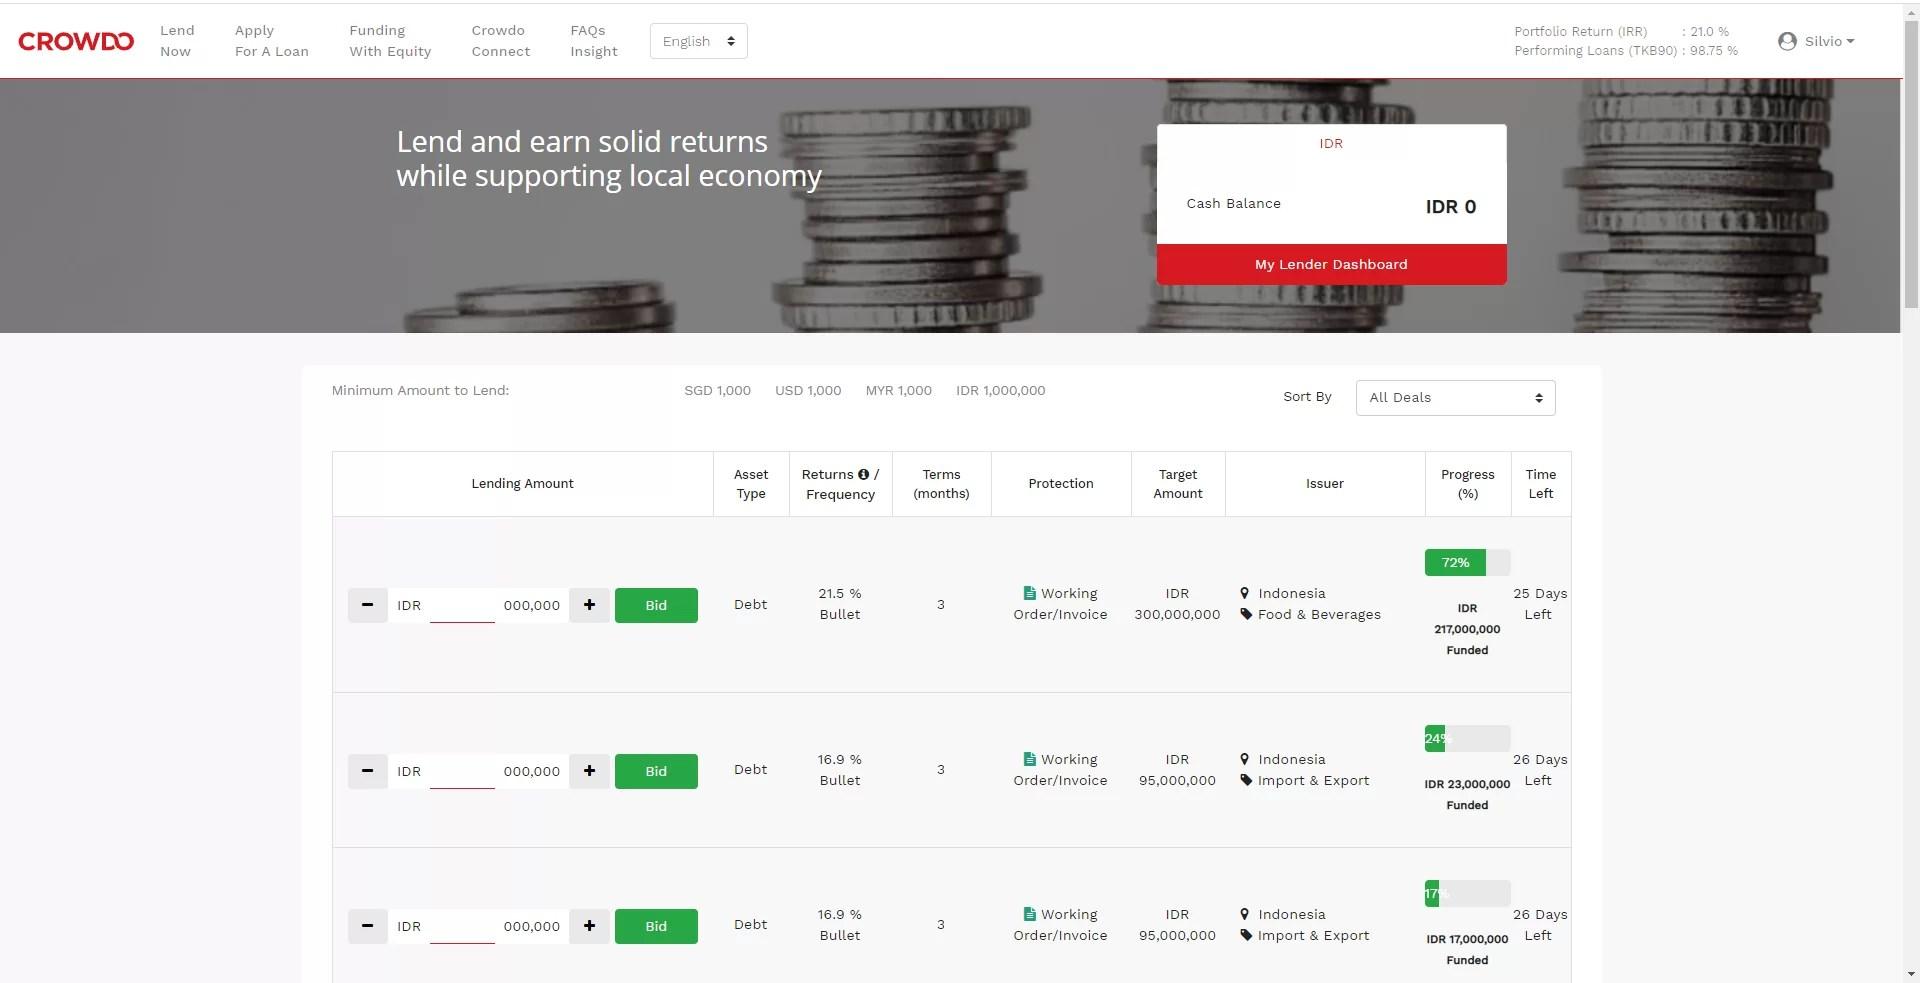 Screenshot meines Crowdo Accounts